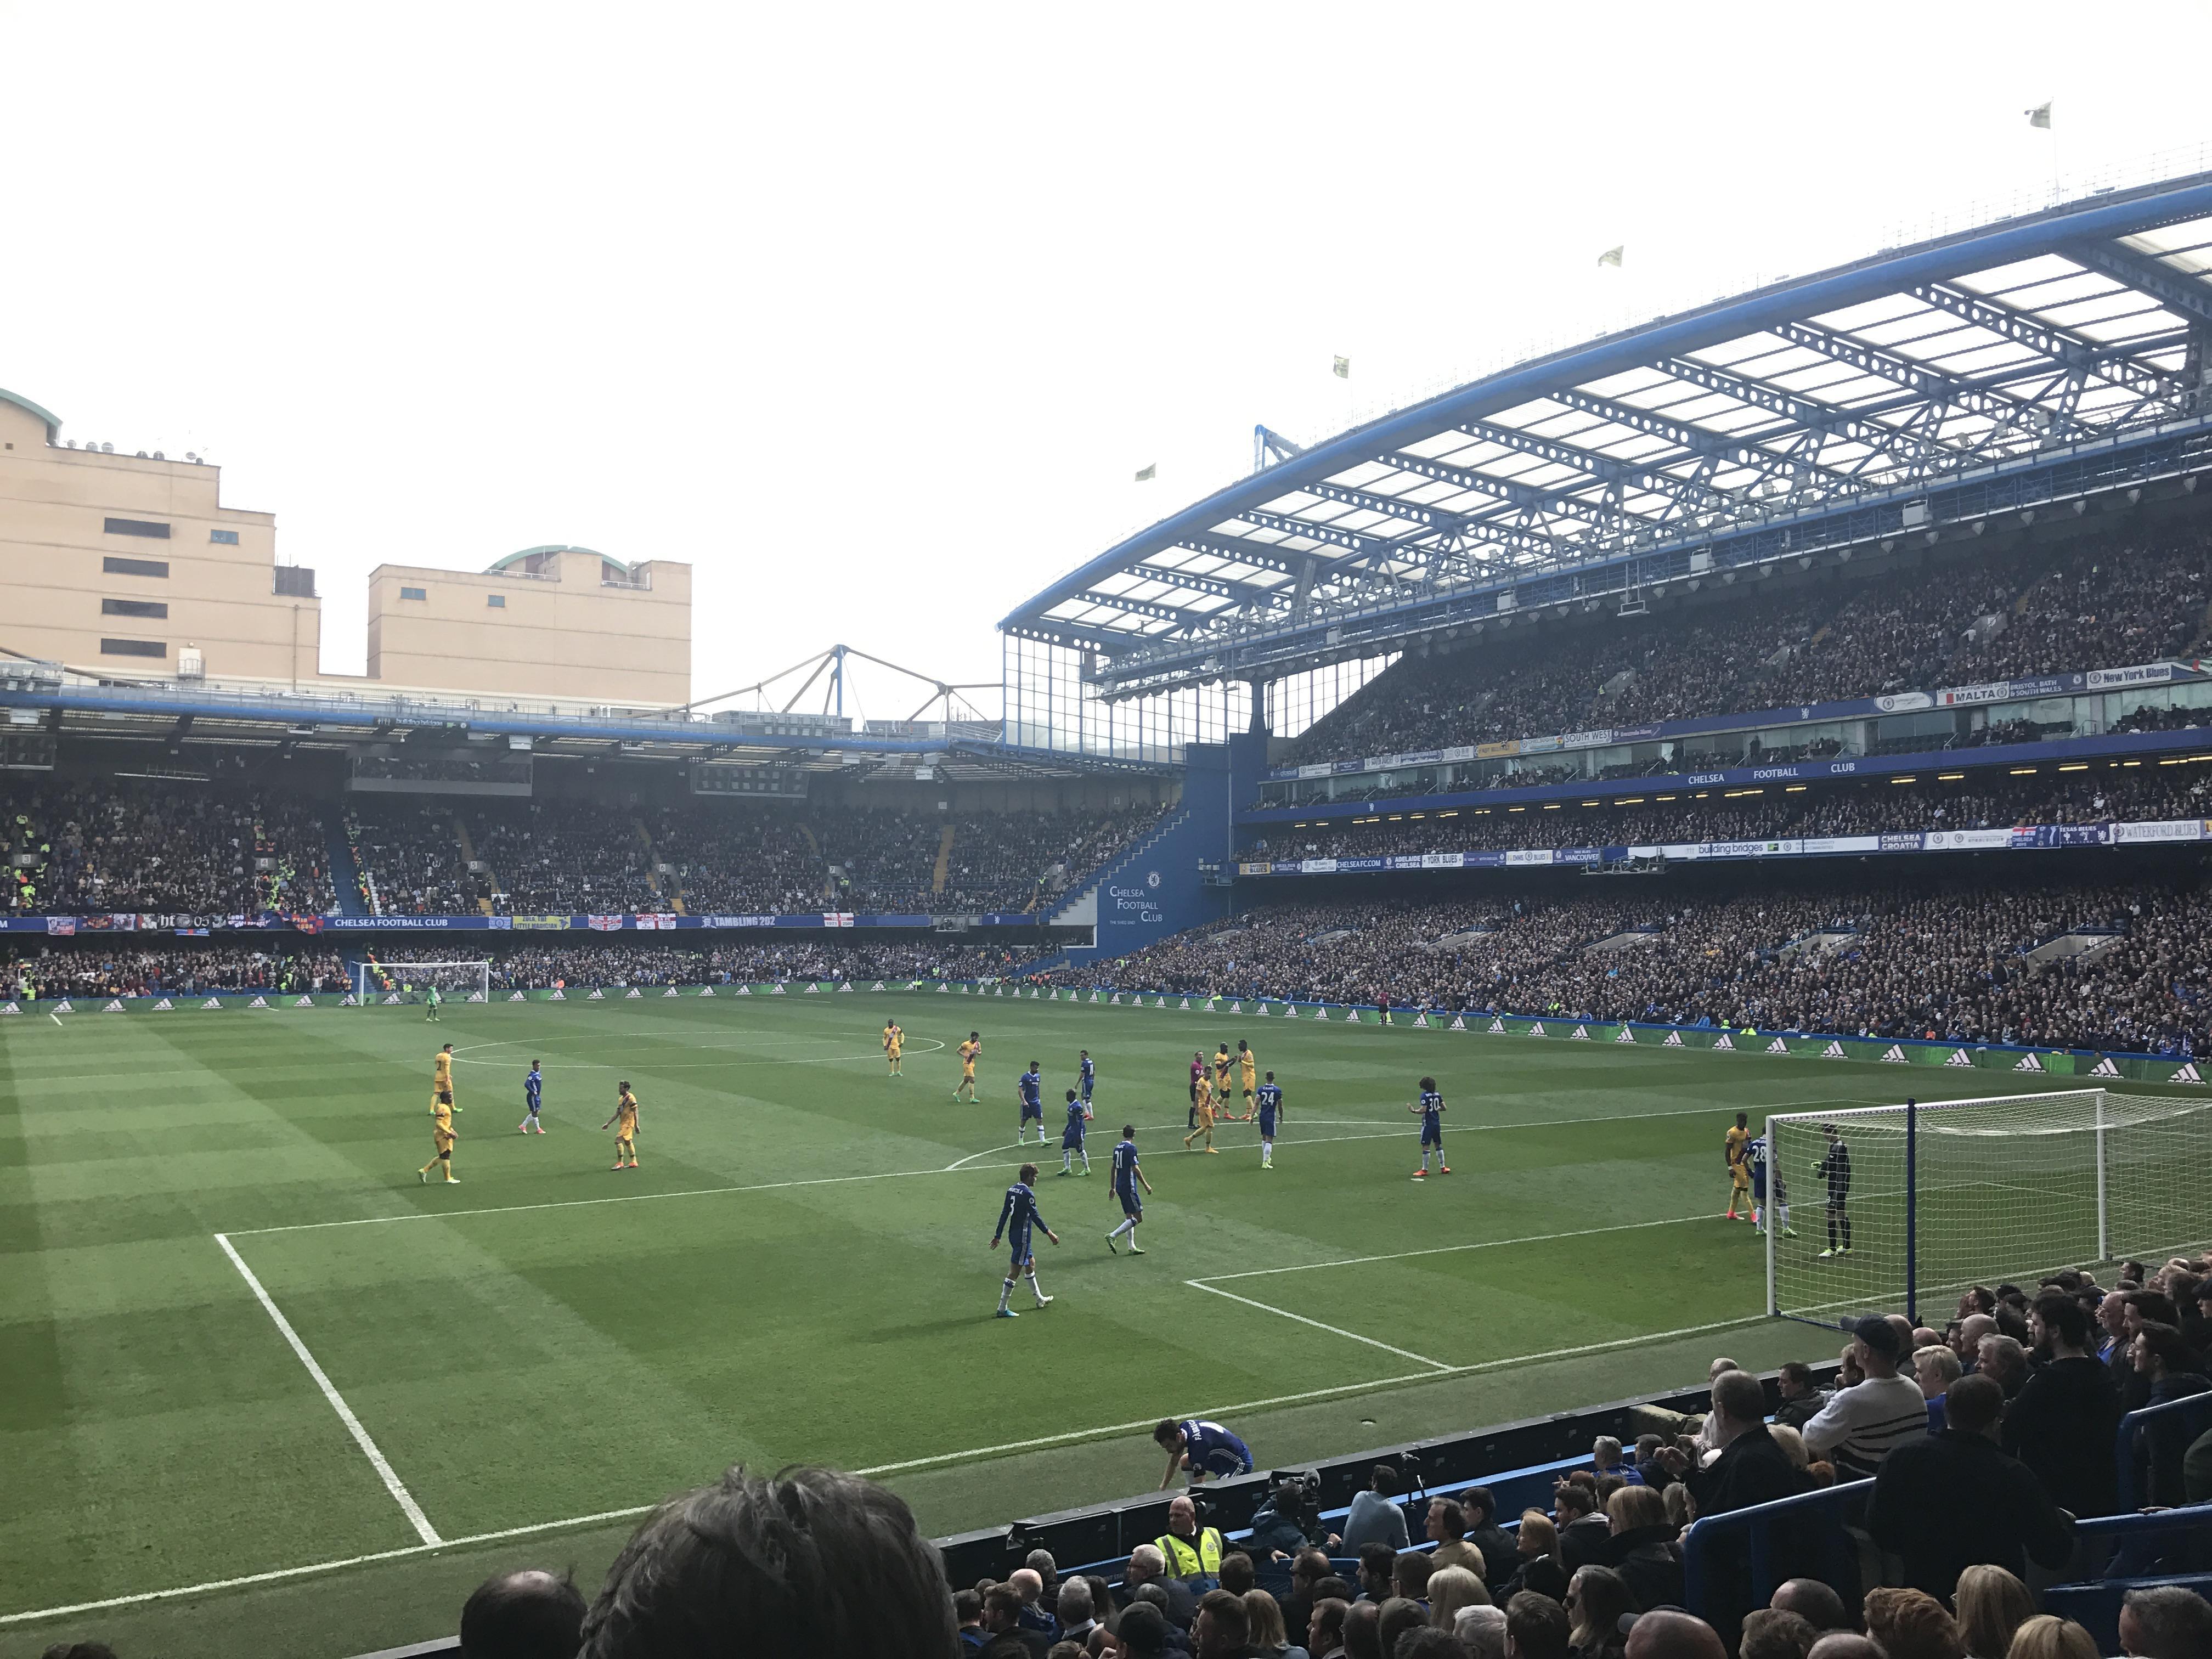 Stamford Bridge Section Matthew Harding Lower 14 Row S Seat 131